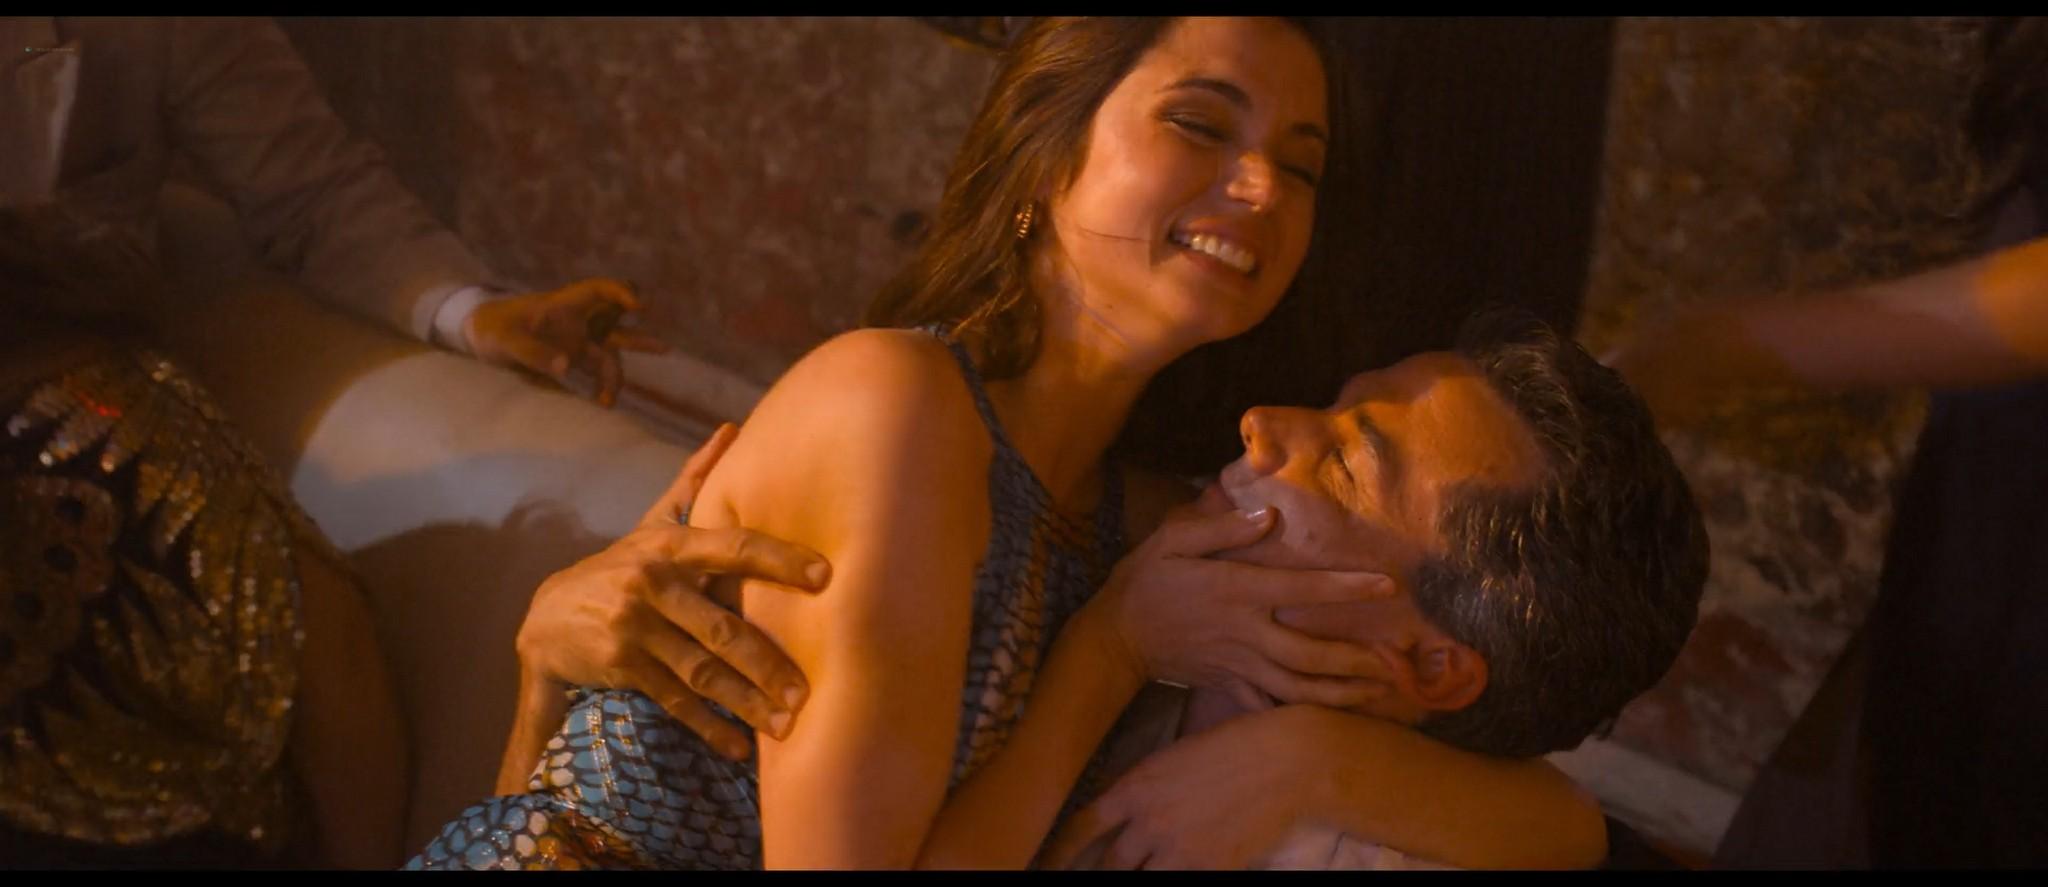 Ana de Armas nude and sex - Wasp Network (2019) HD 1080p Web (13)